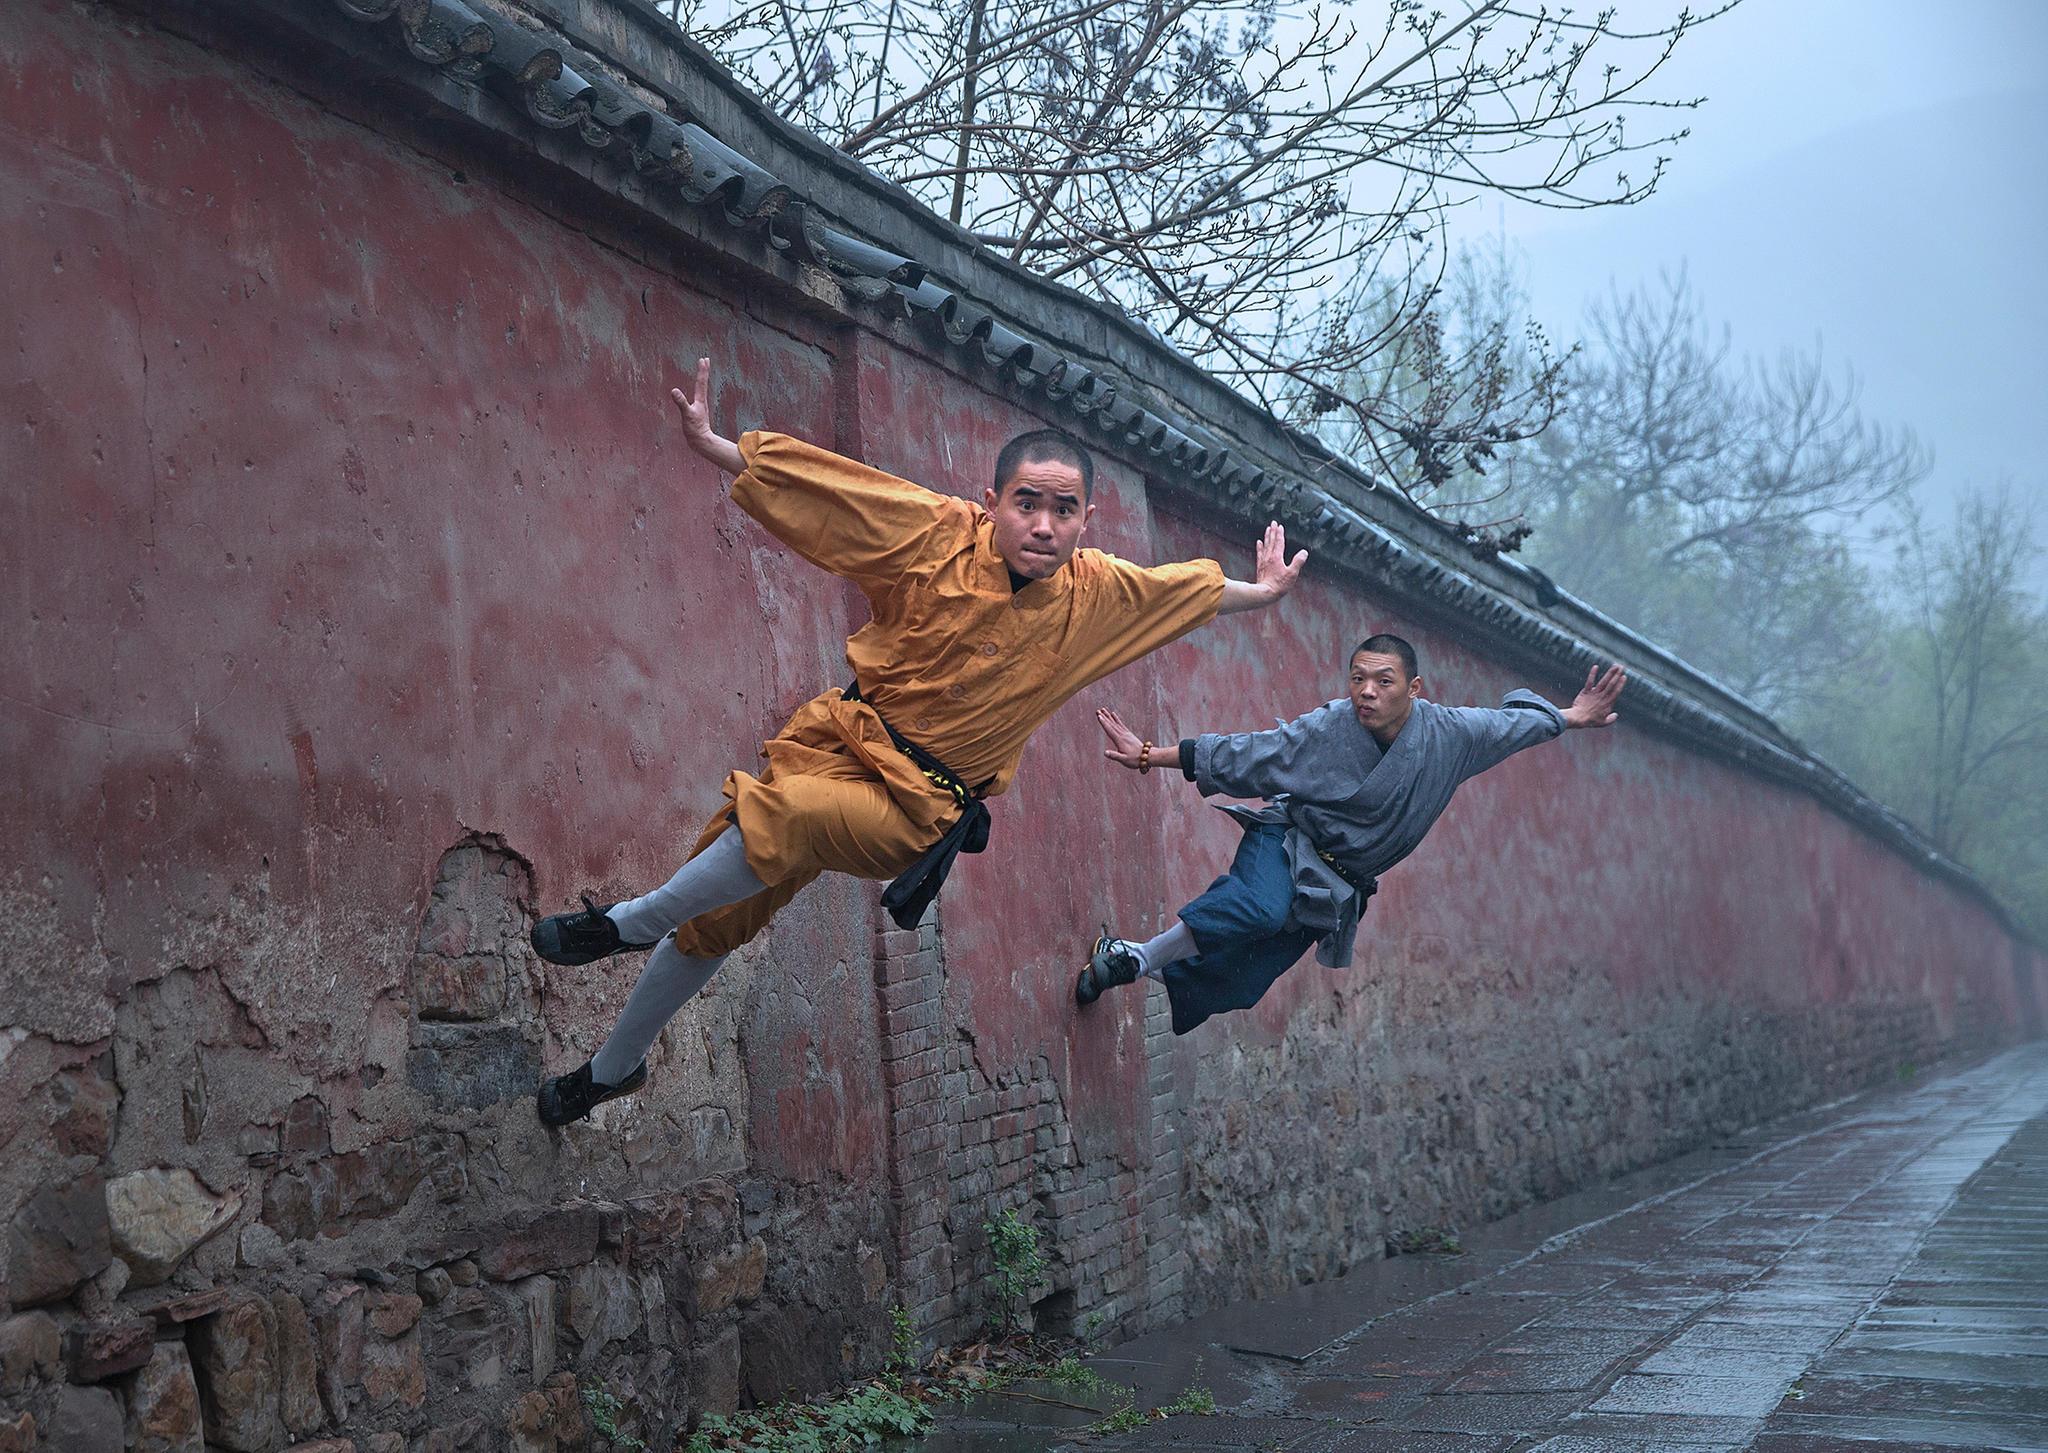 Luo Pin Xi, China (Professional, Sport)